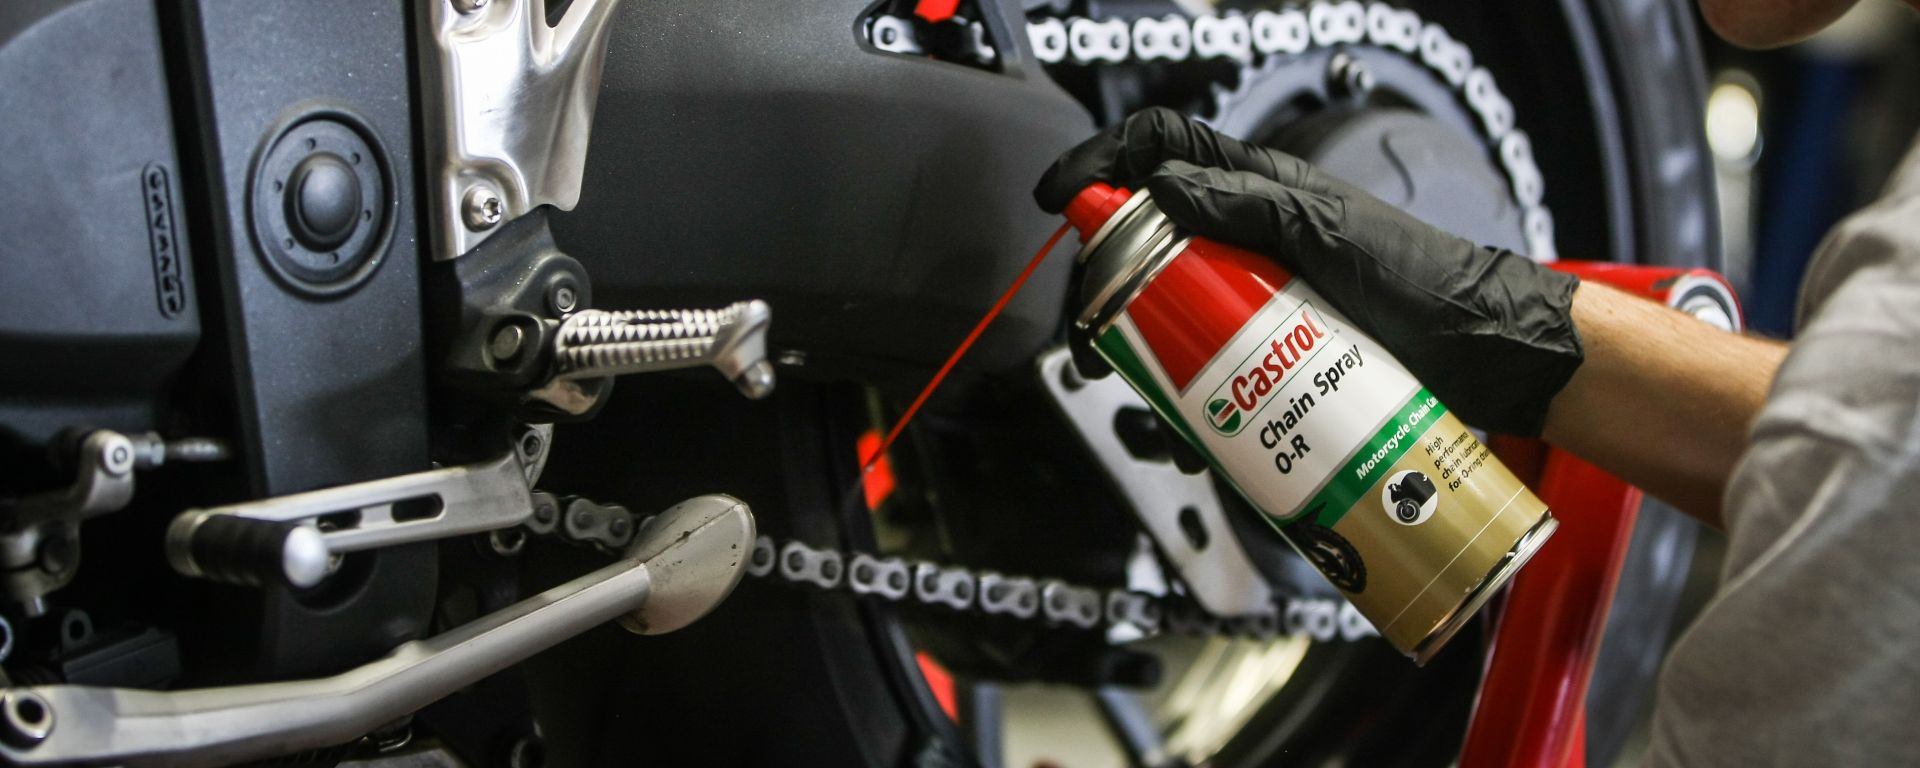 manutenzione catena moto